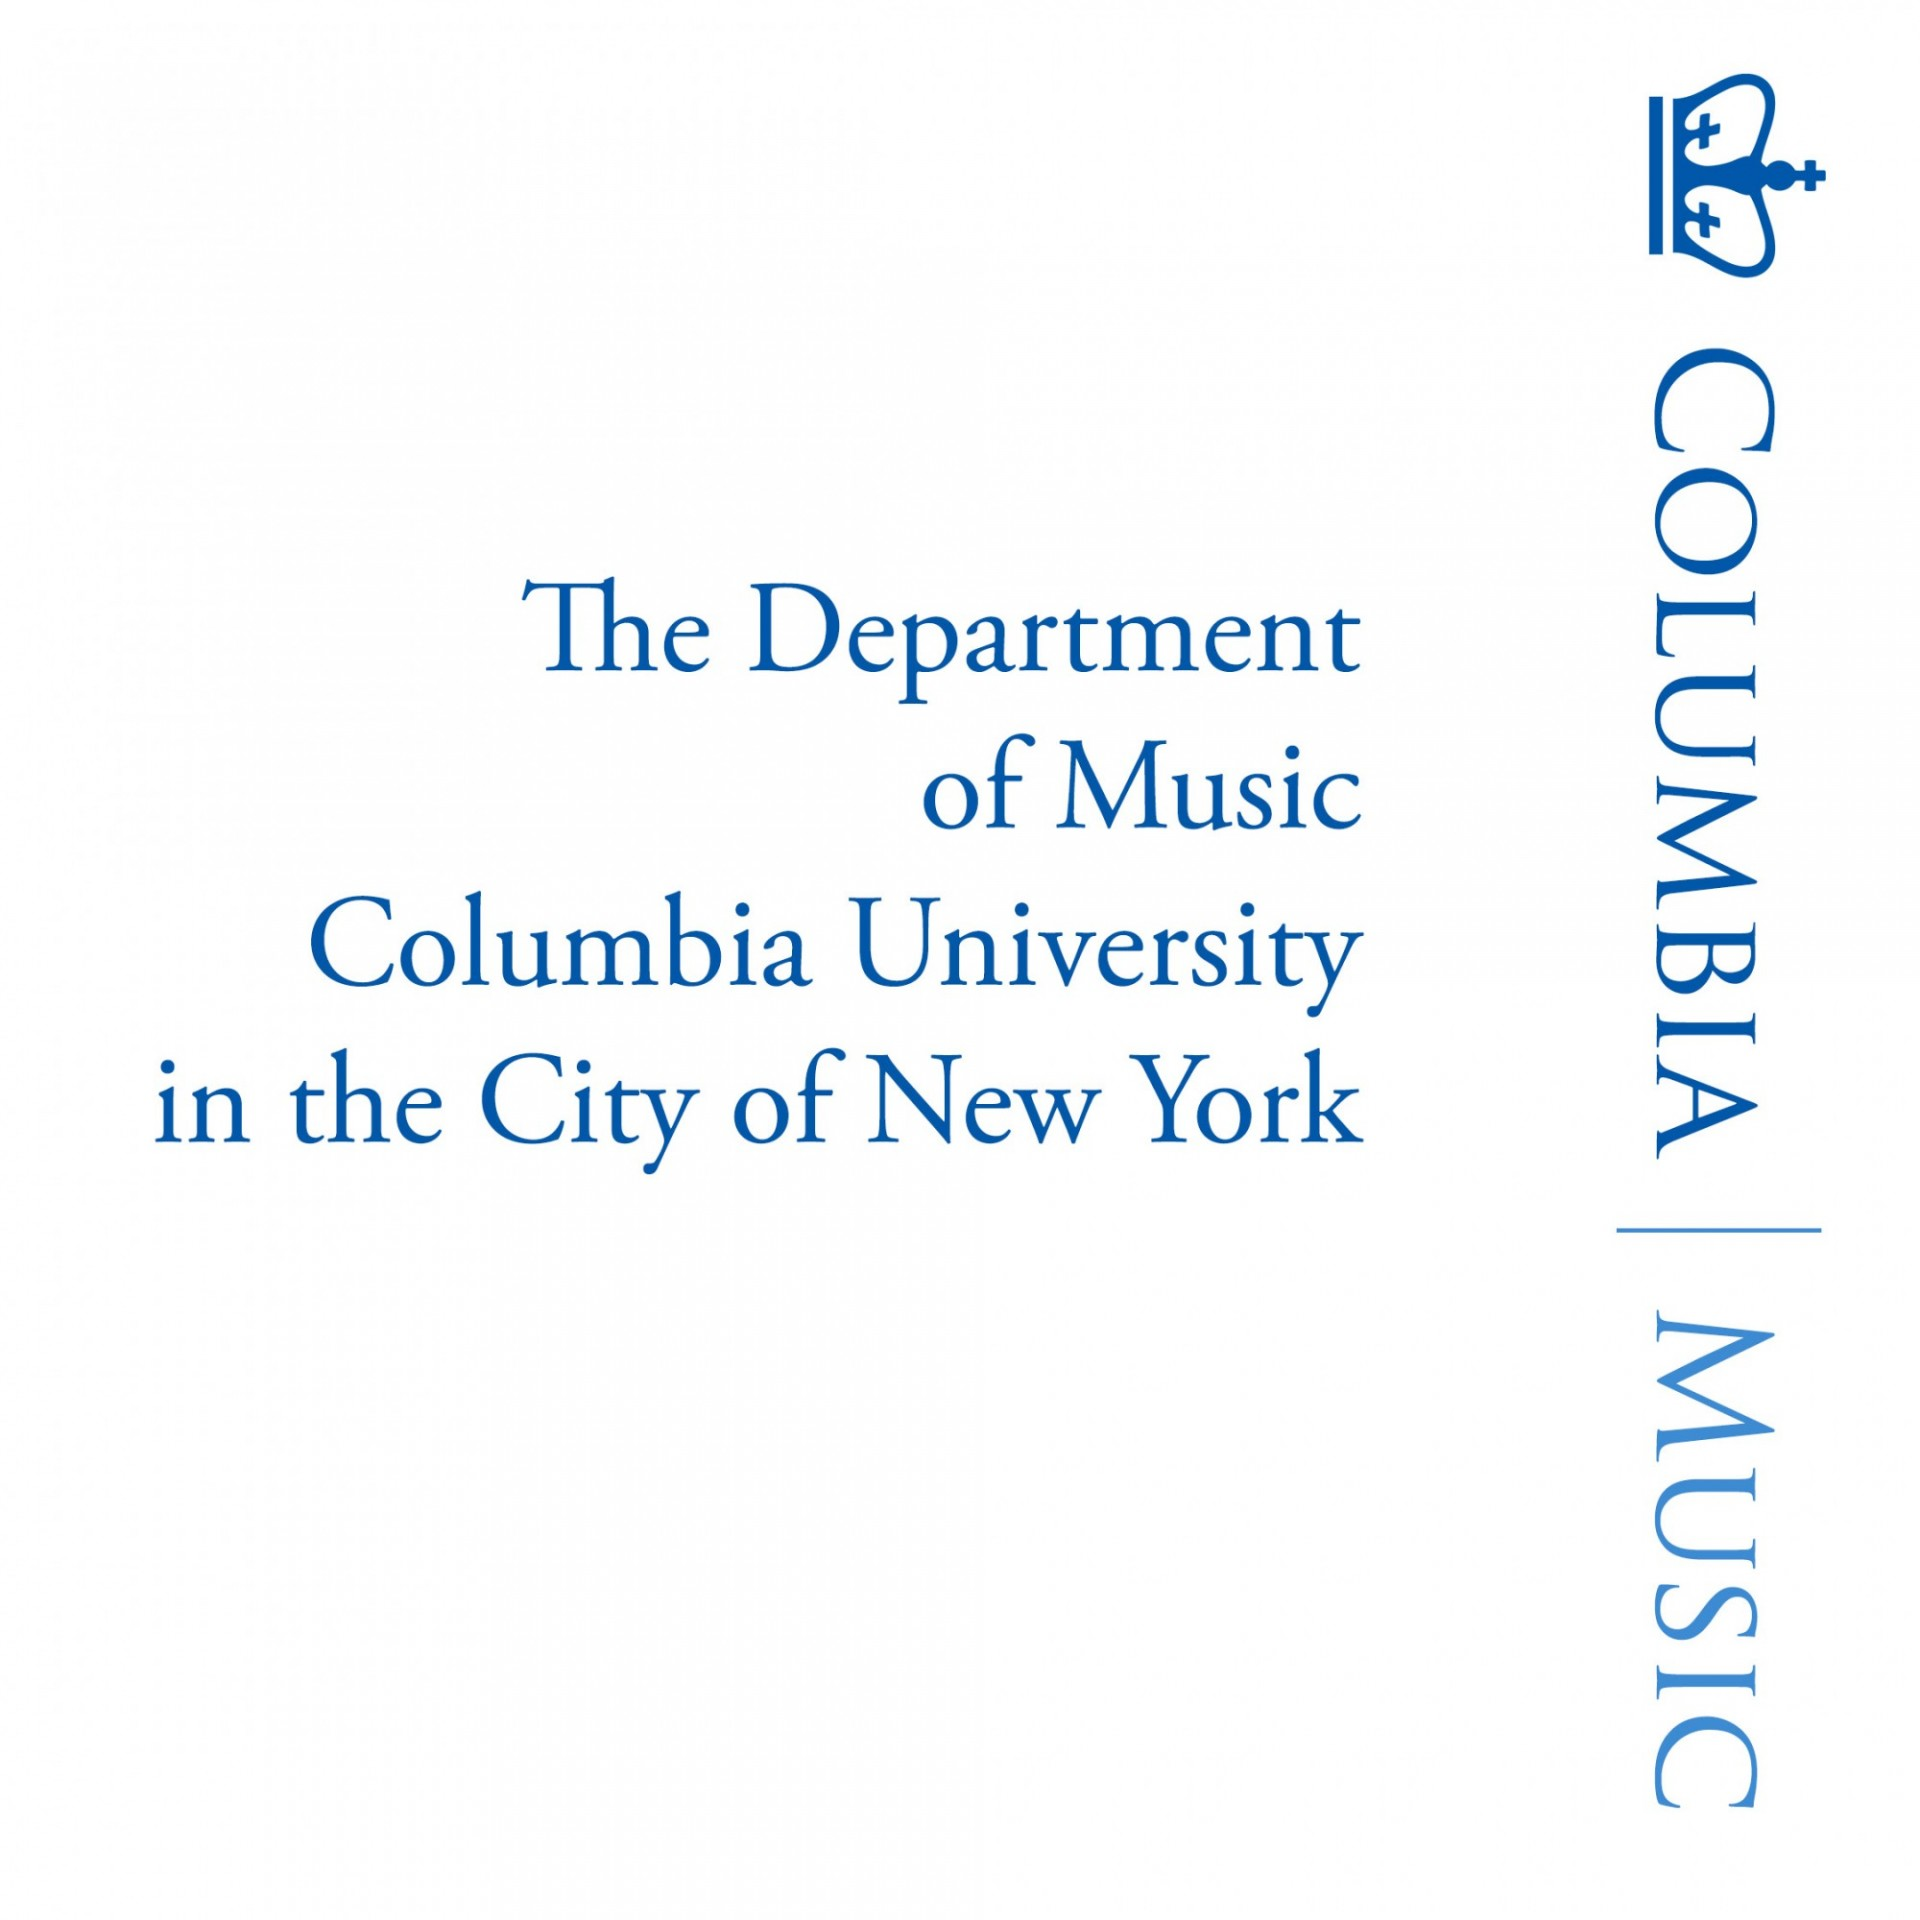 photo of Columbia University Department of Music